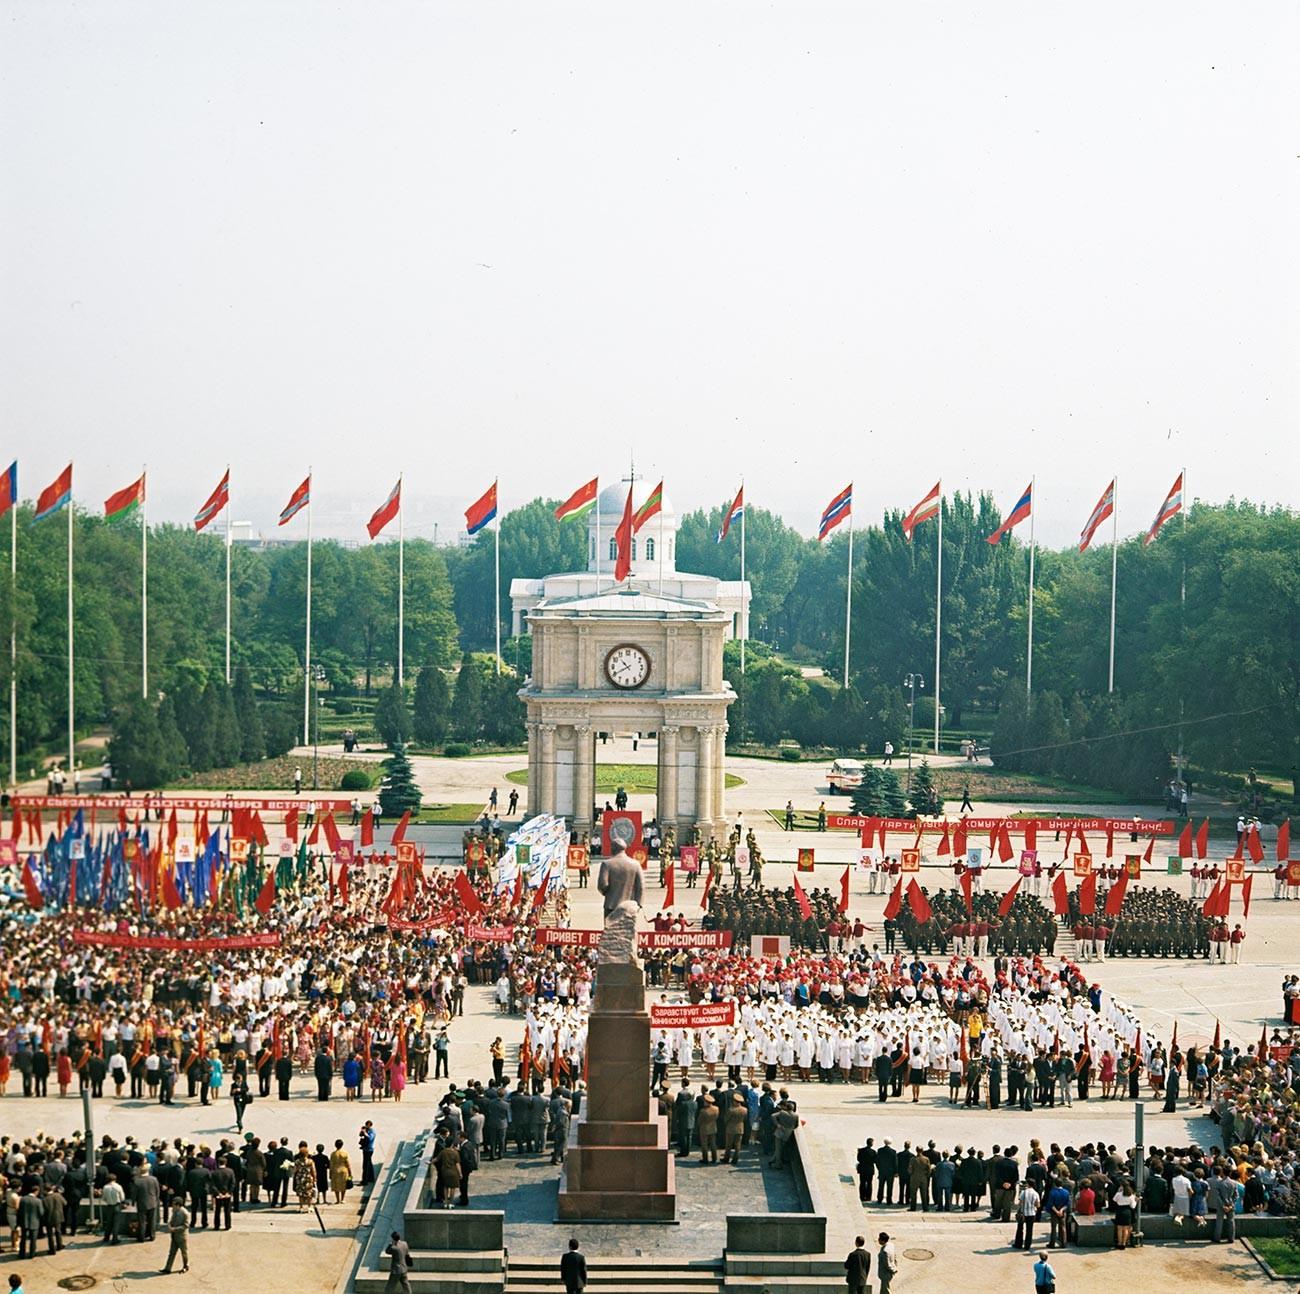 Perayaan Hari Kemenangan di Lapangan Kemenangan, Chisinau, 1976.